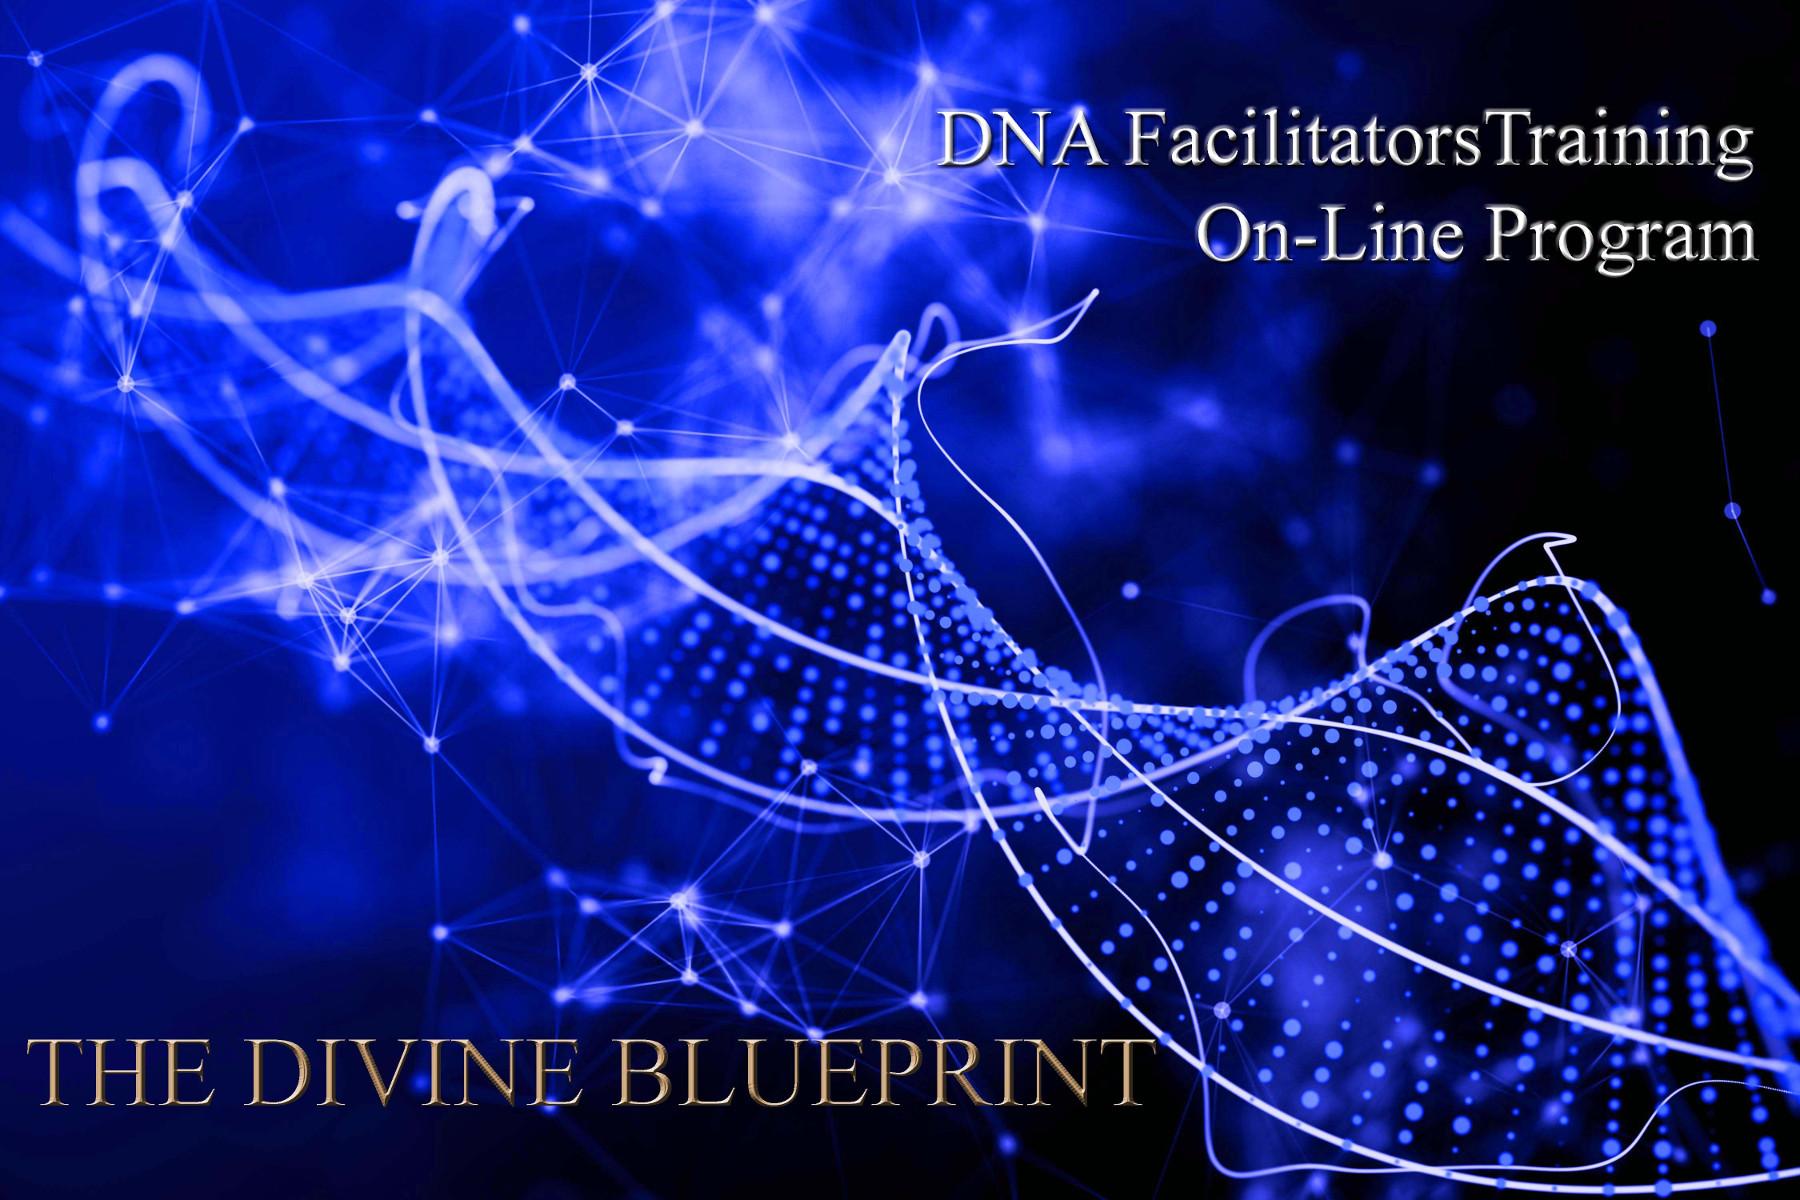 Patricia Cori Courses The Divine Blueprint